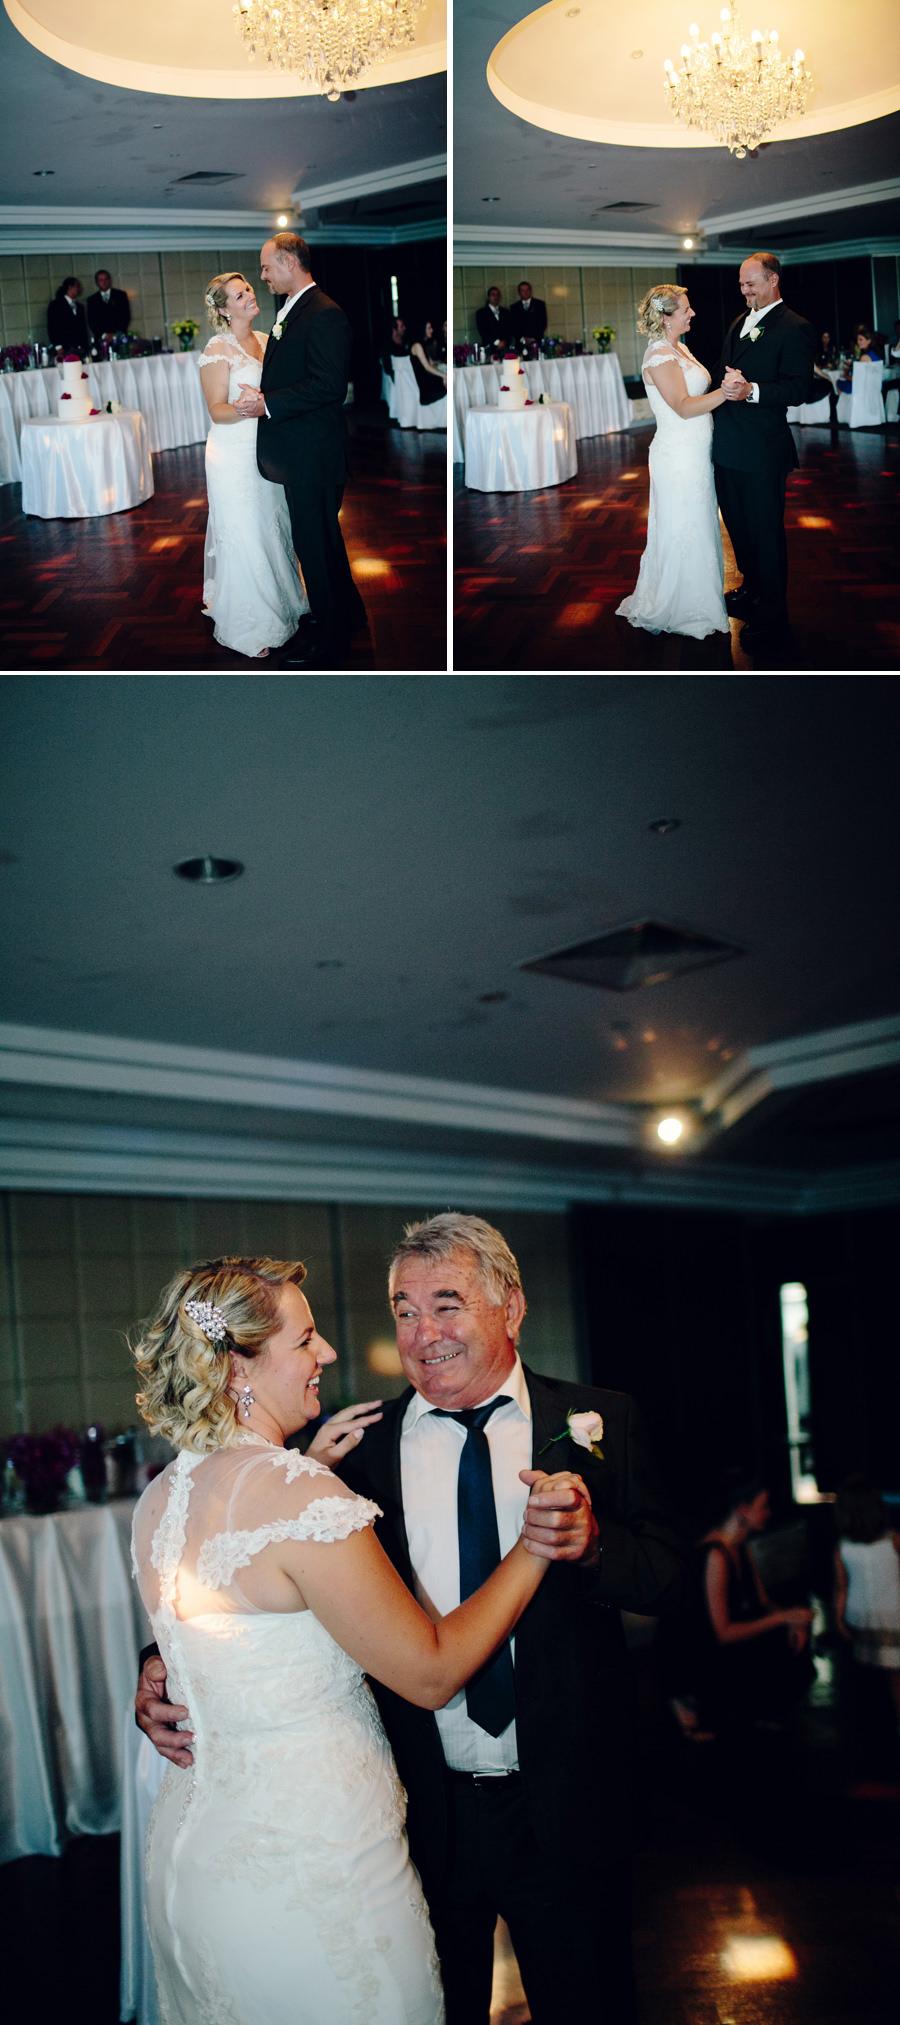 Sylvania Waters Wedding Photographer: Bridal waltz